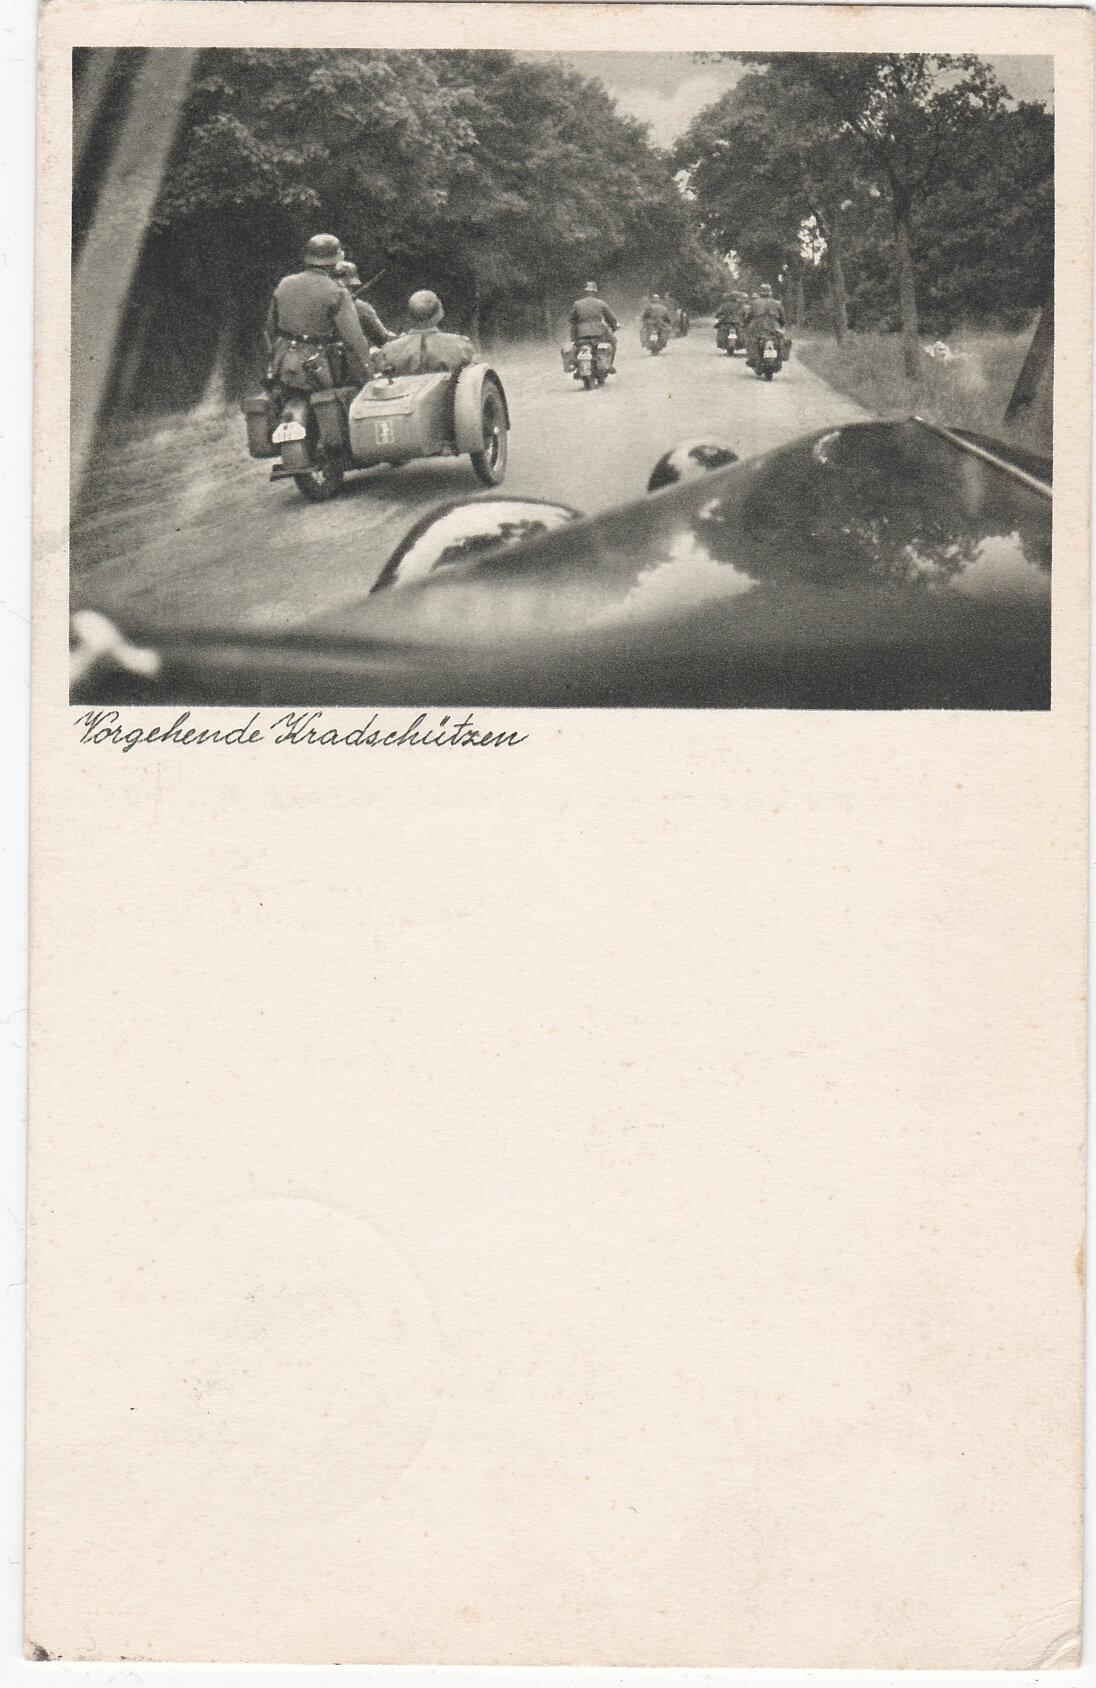 Postkaart vorgehende kradschutzen